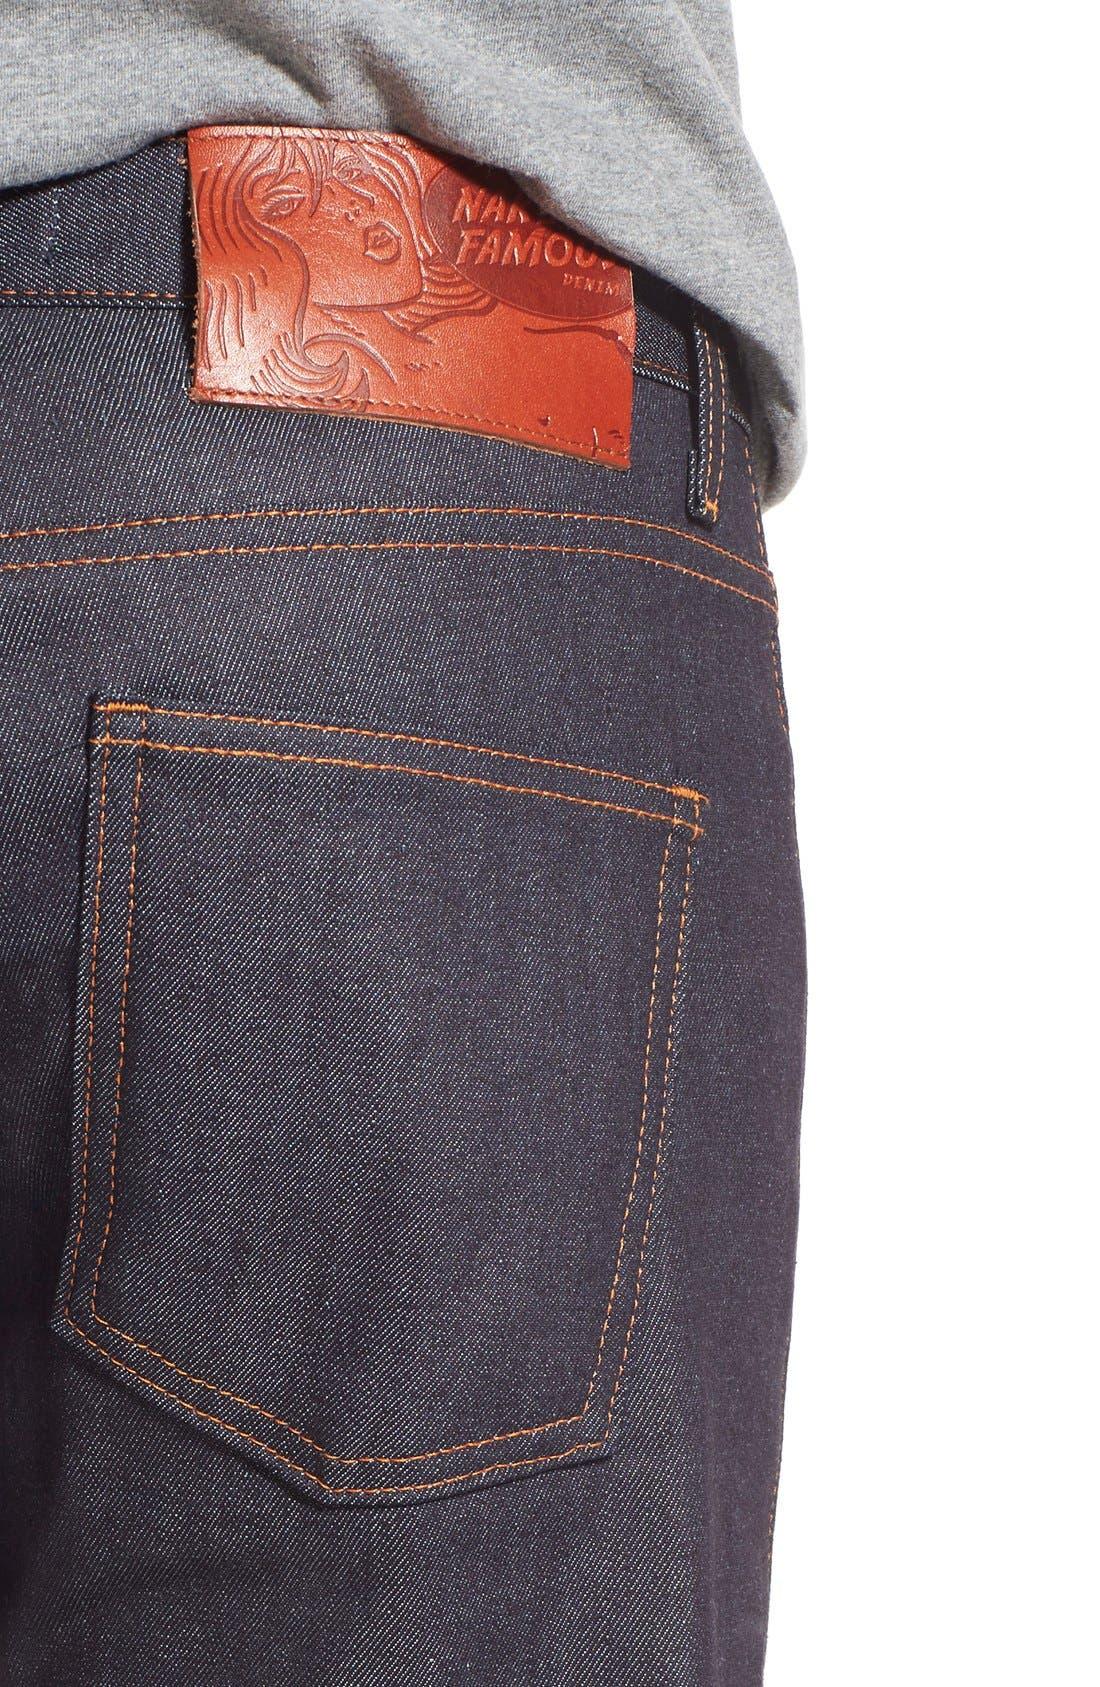 'Super Skinny Guy' Skinny Fit Selvedge Jeans,                             Alternate thumbnail 5, color,                             11OZ STRETCH